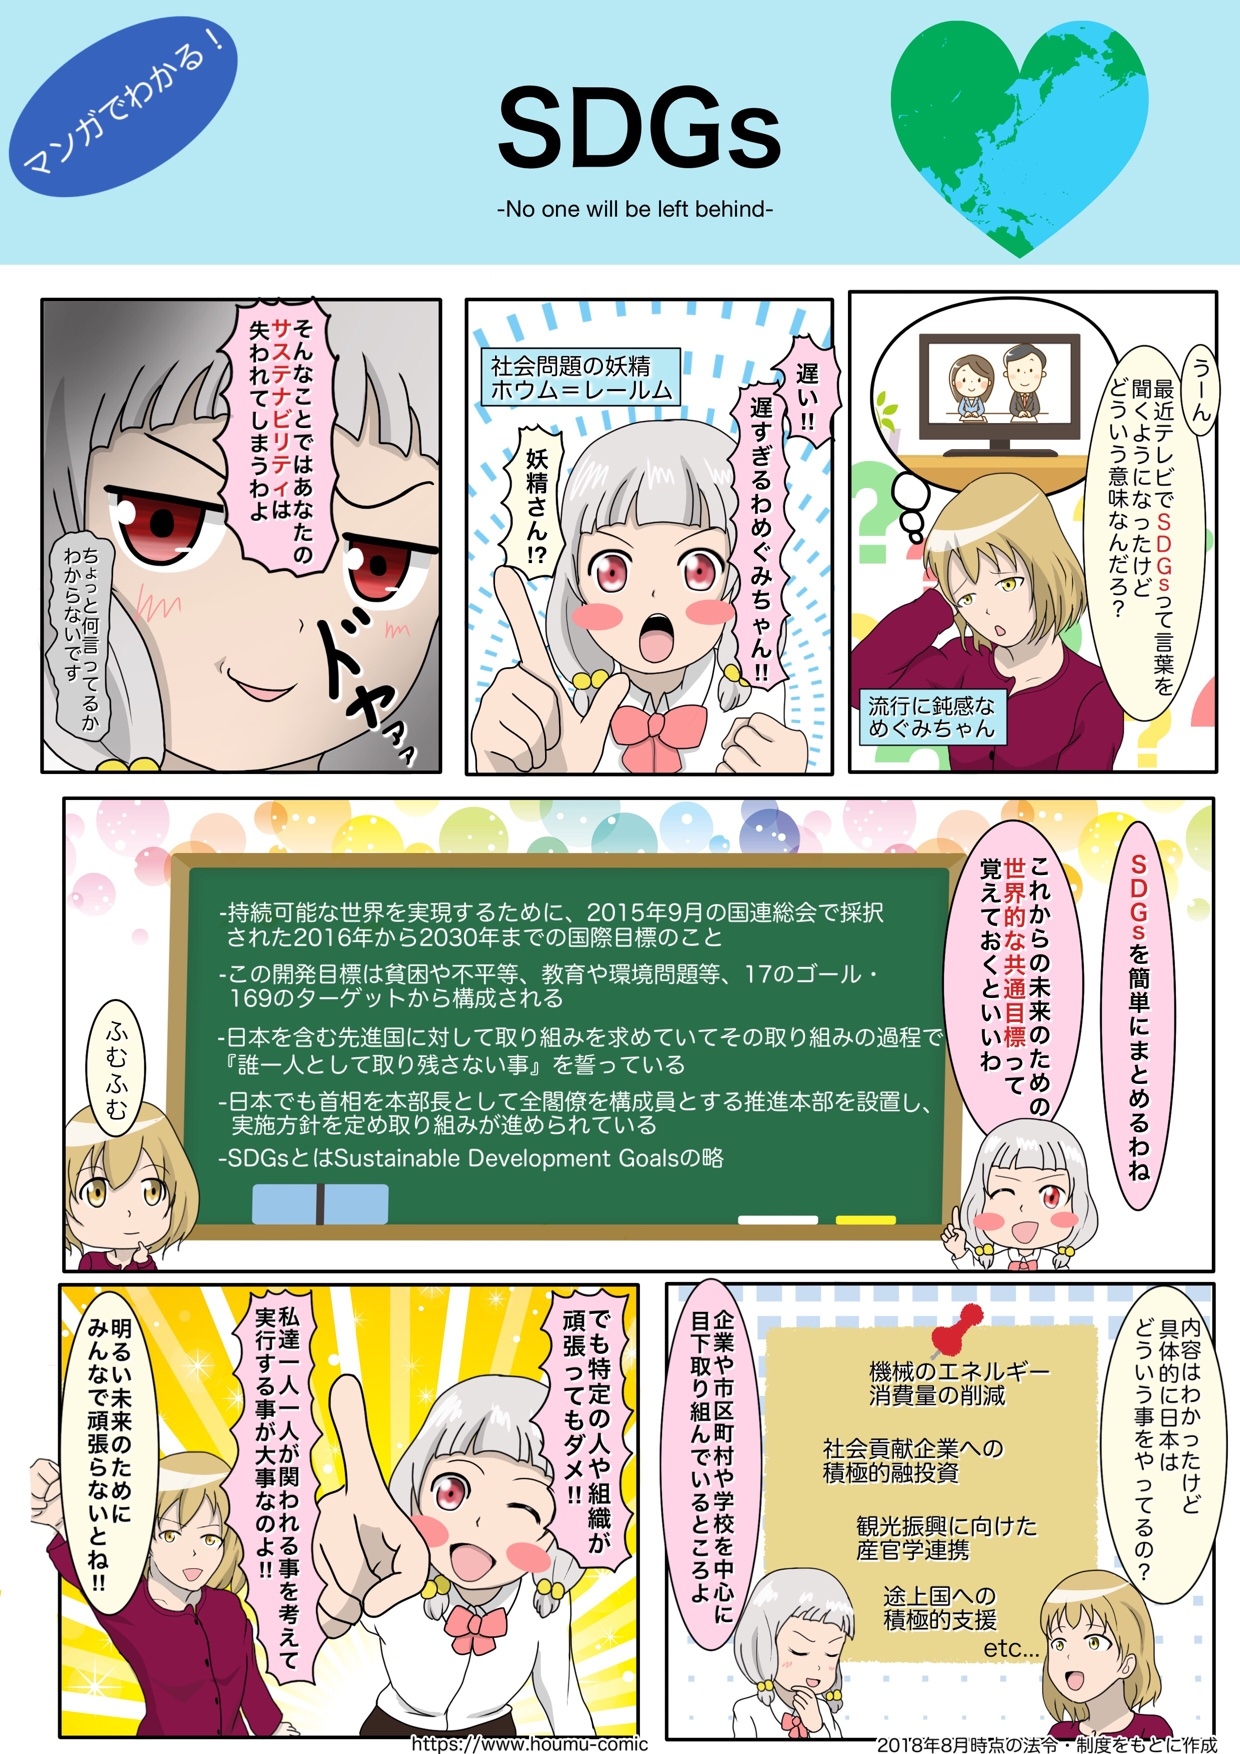 f:id:houmu_comic:20180820211044j:plain